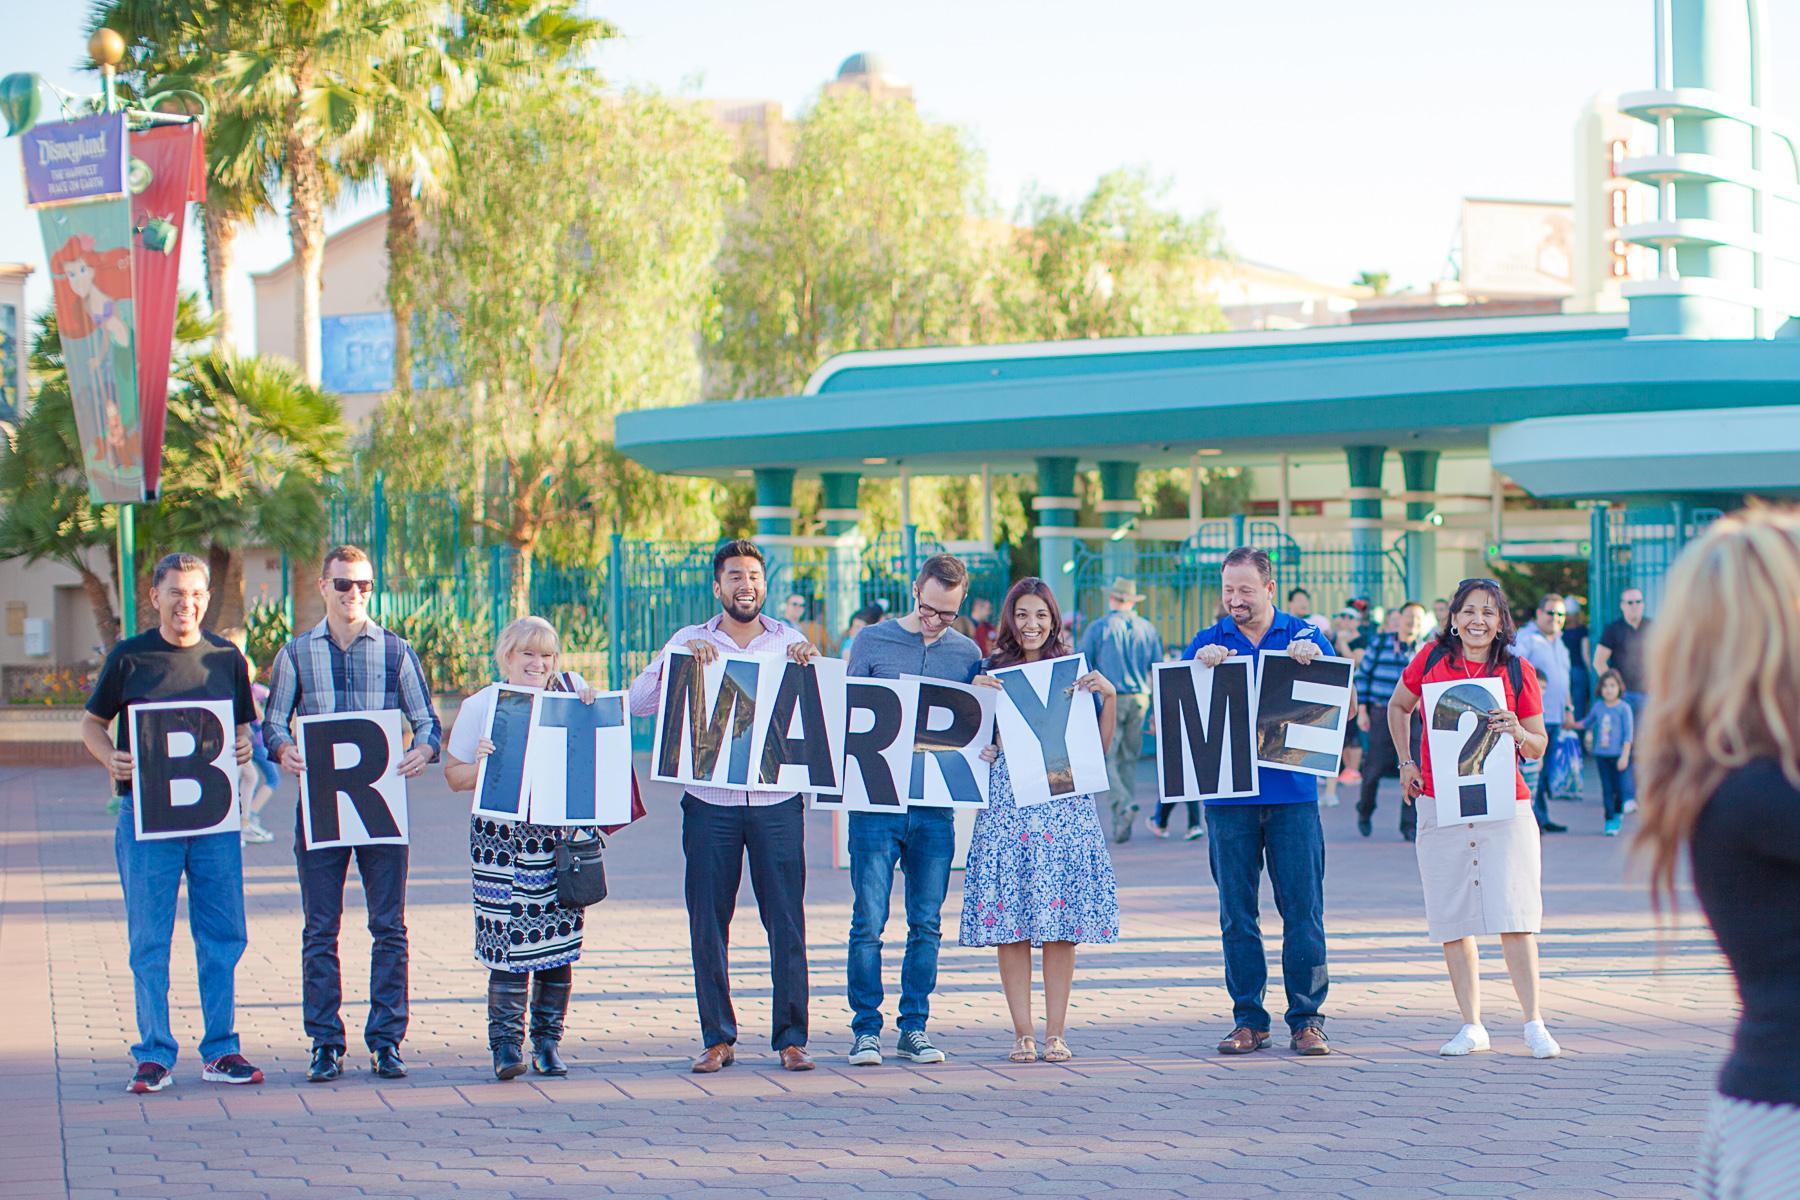 Image 6 of Magical Disneyland Proposal